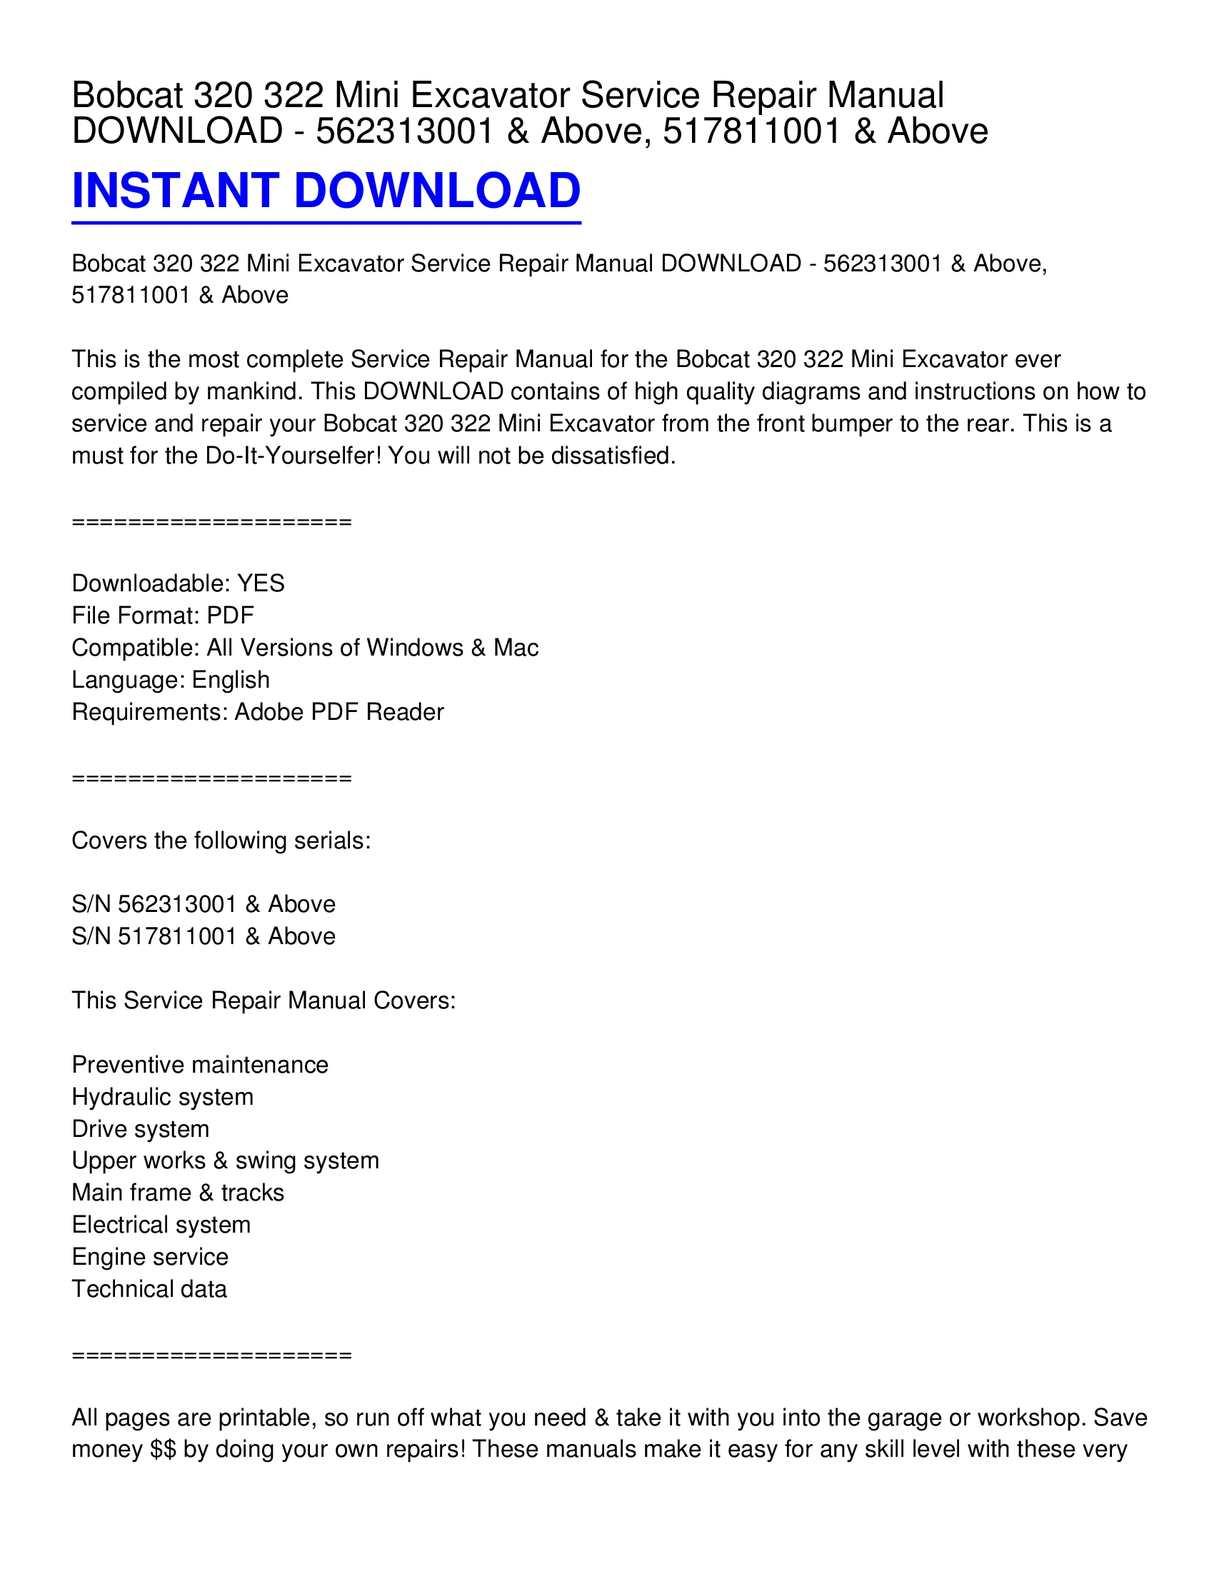 Calaméo - Bobcat 320 322 Mini Excavator Service Repair Manual DOWNLOAD -  562313001 & Above, 517811001 & Above